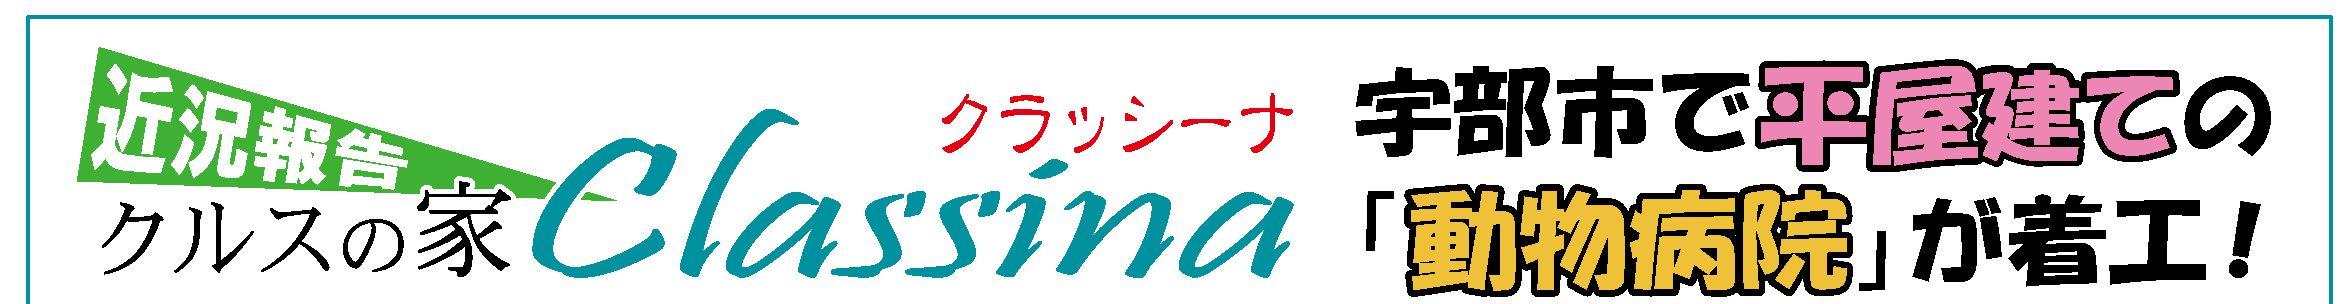 KuraSi-natu-sin103-05.jpg